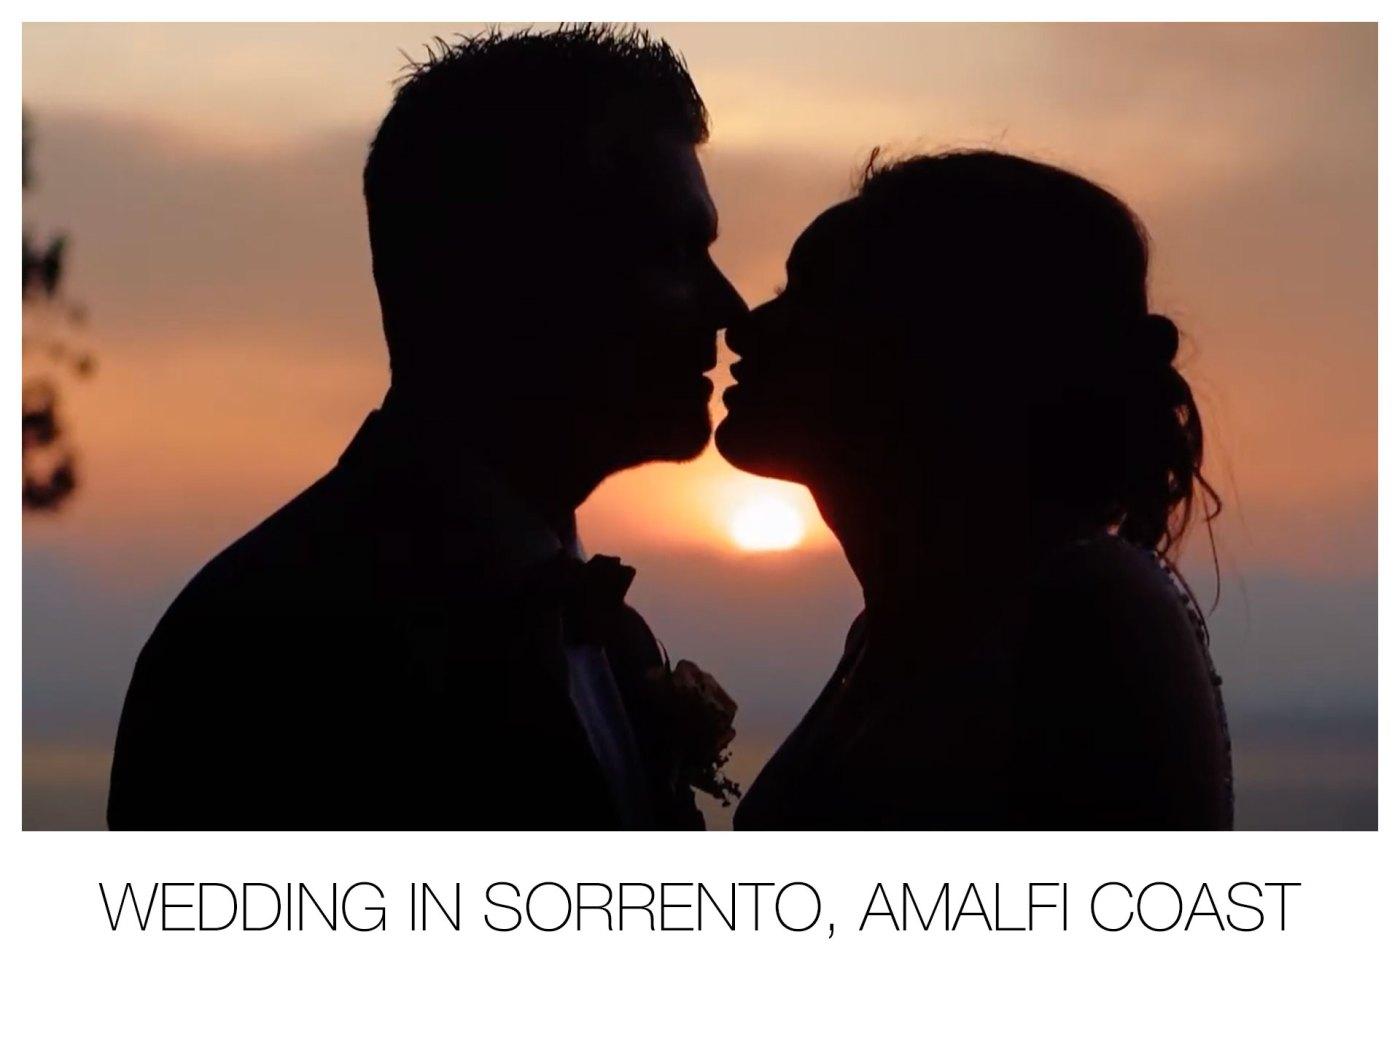 Wedding in Sorrento, Amalfi Coast.